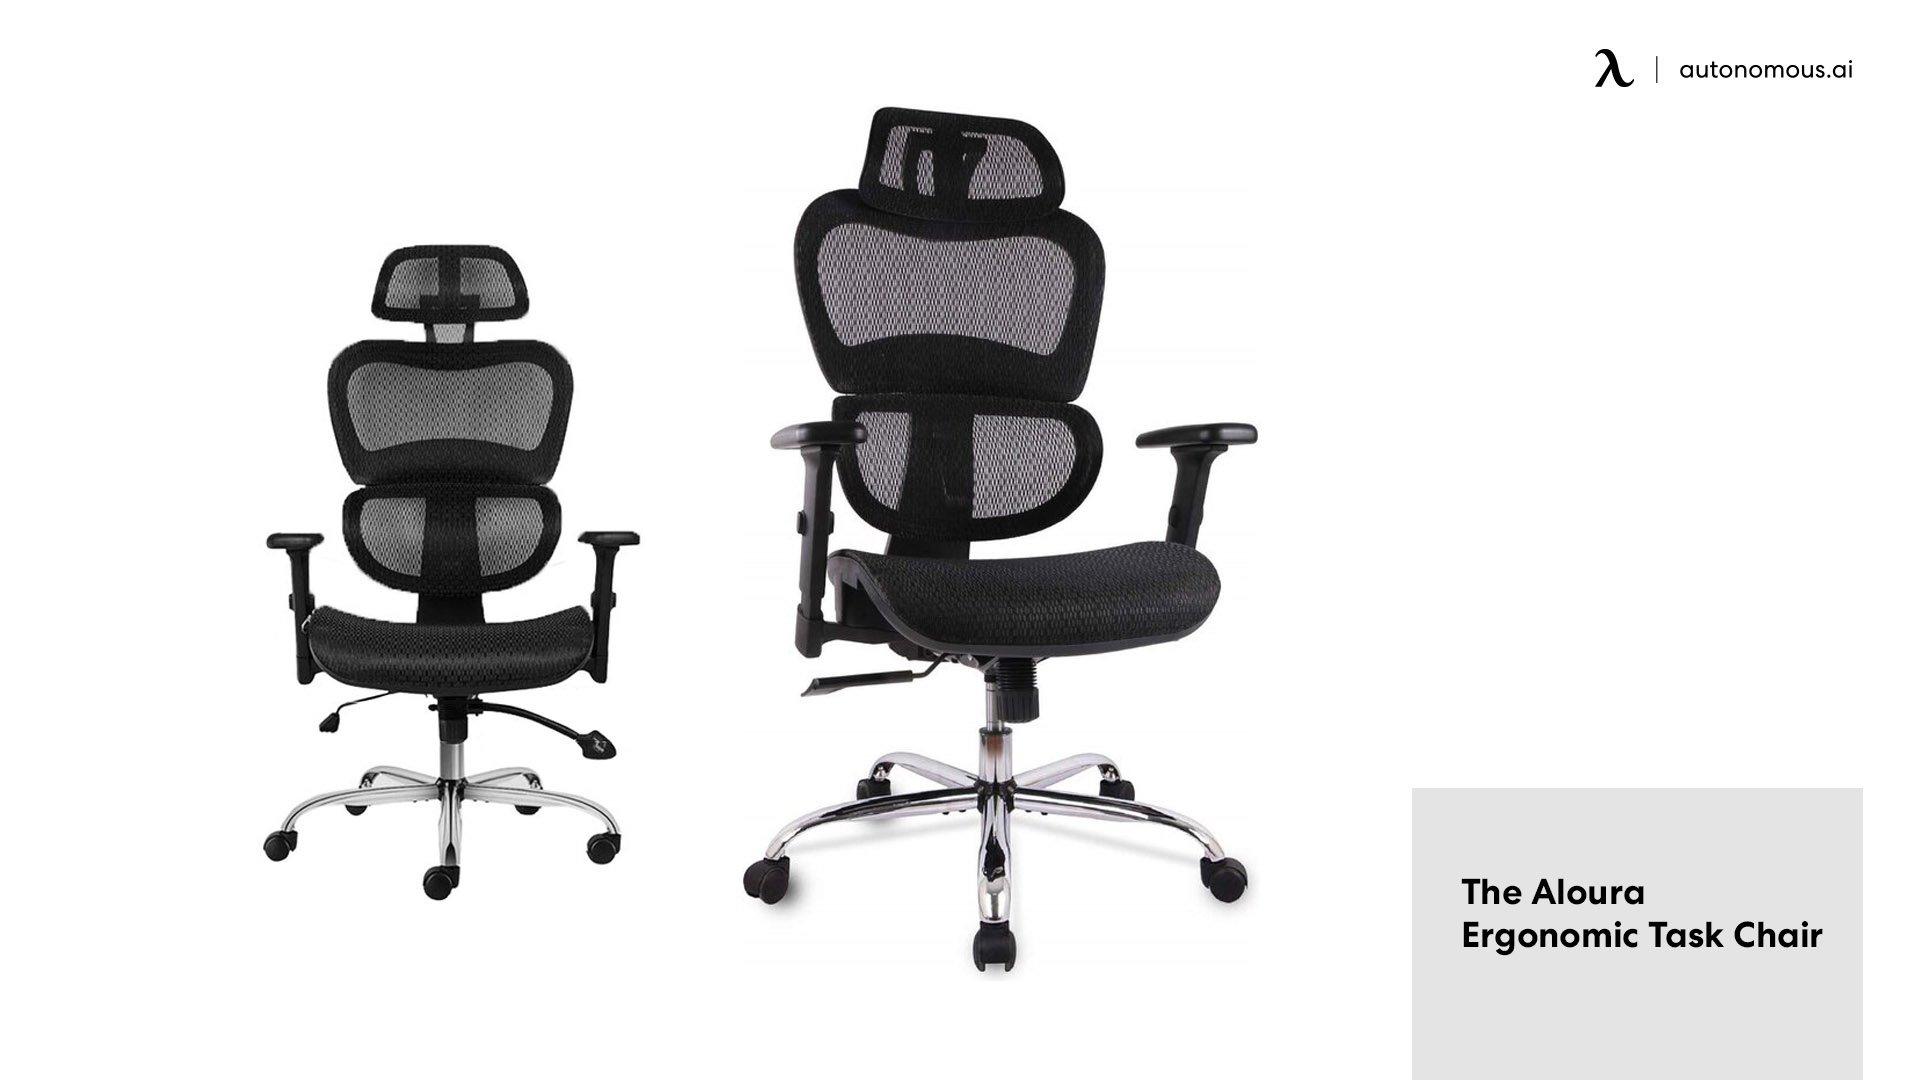 The Aloura Ergonomic Task Chair